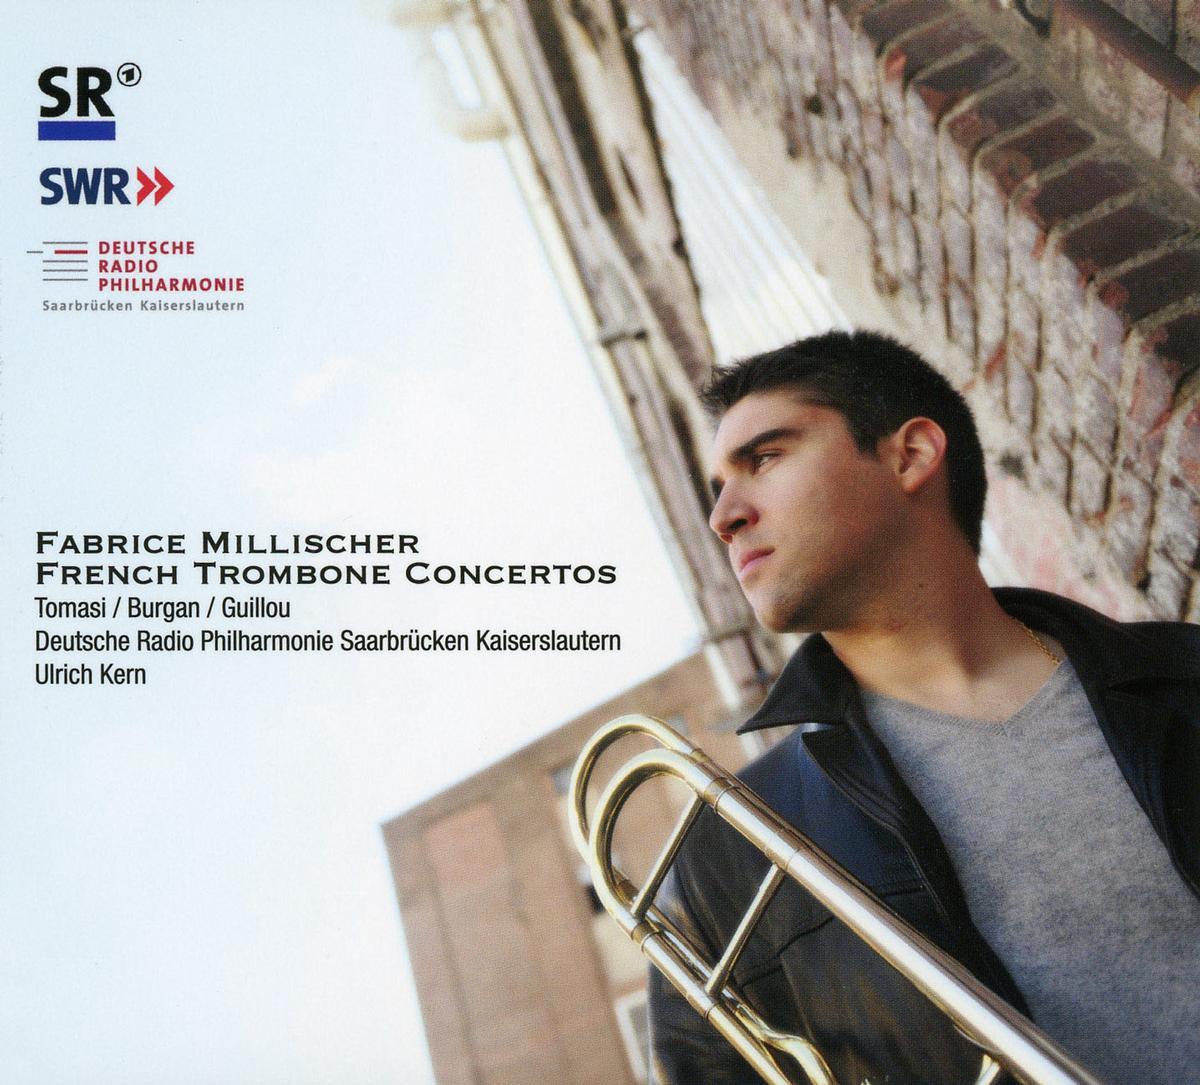 French Trombone Concertos